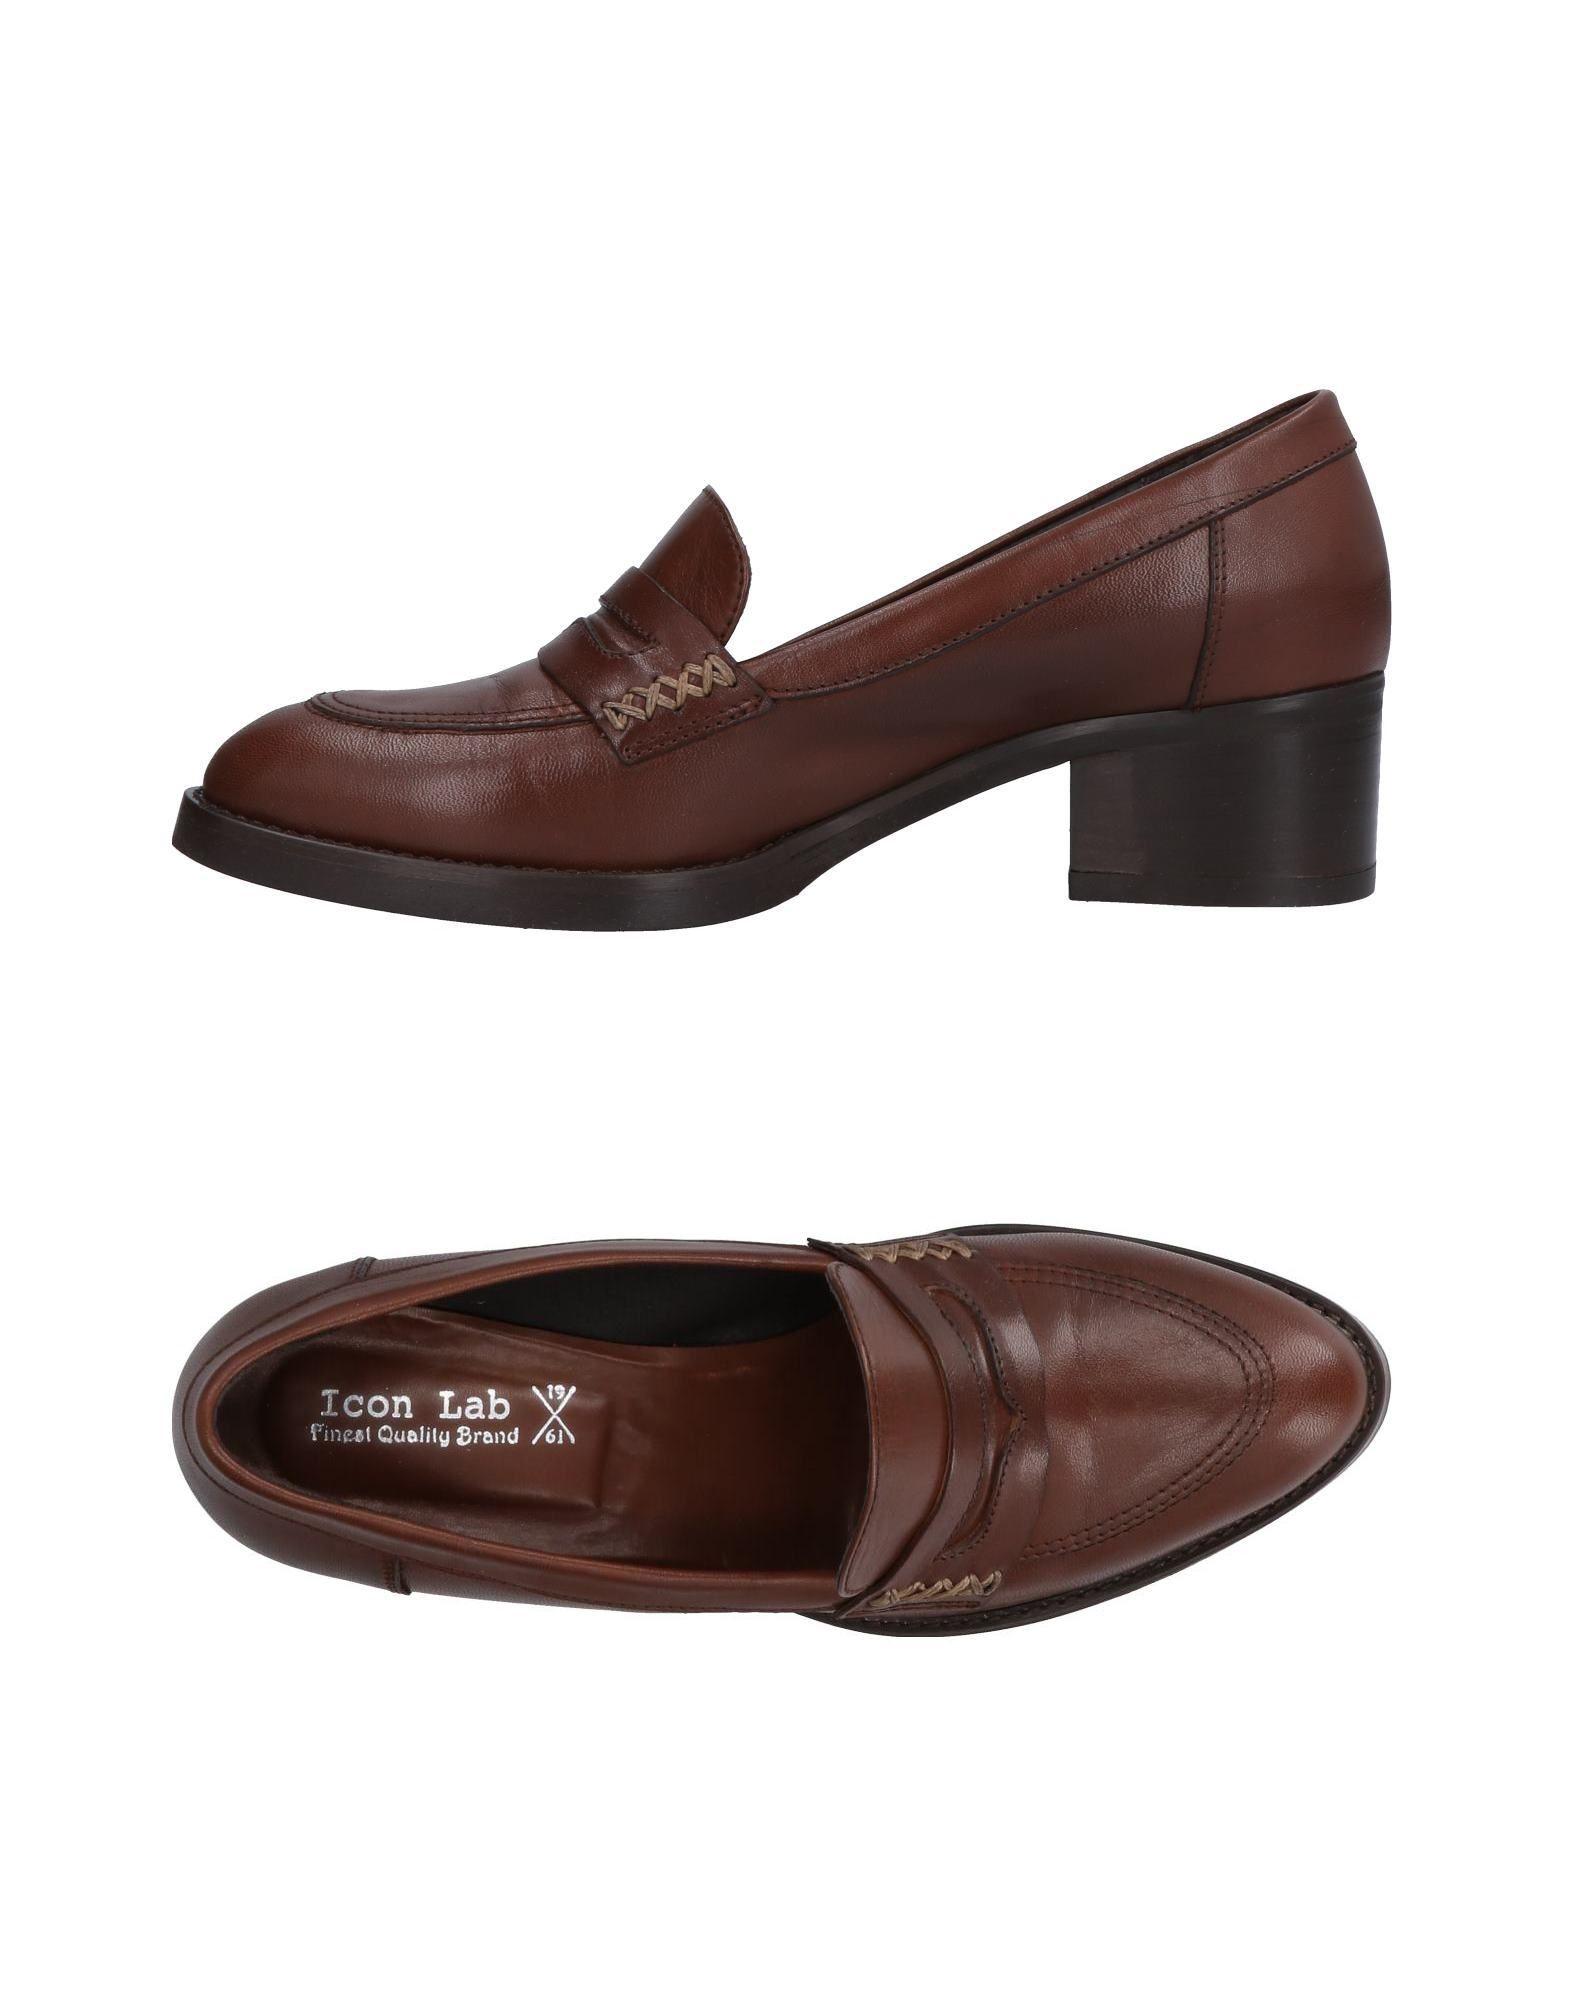 Icon Lab 1961 Mokassins Damen  11479897VU Gute Qualität beliebte Schuhe